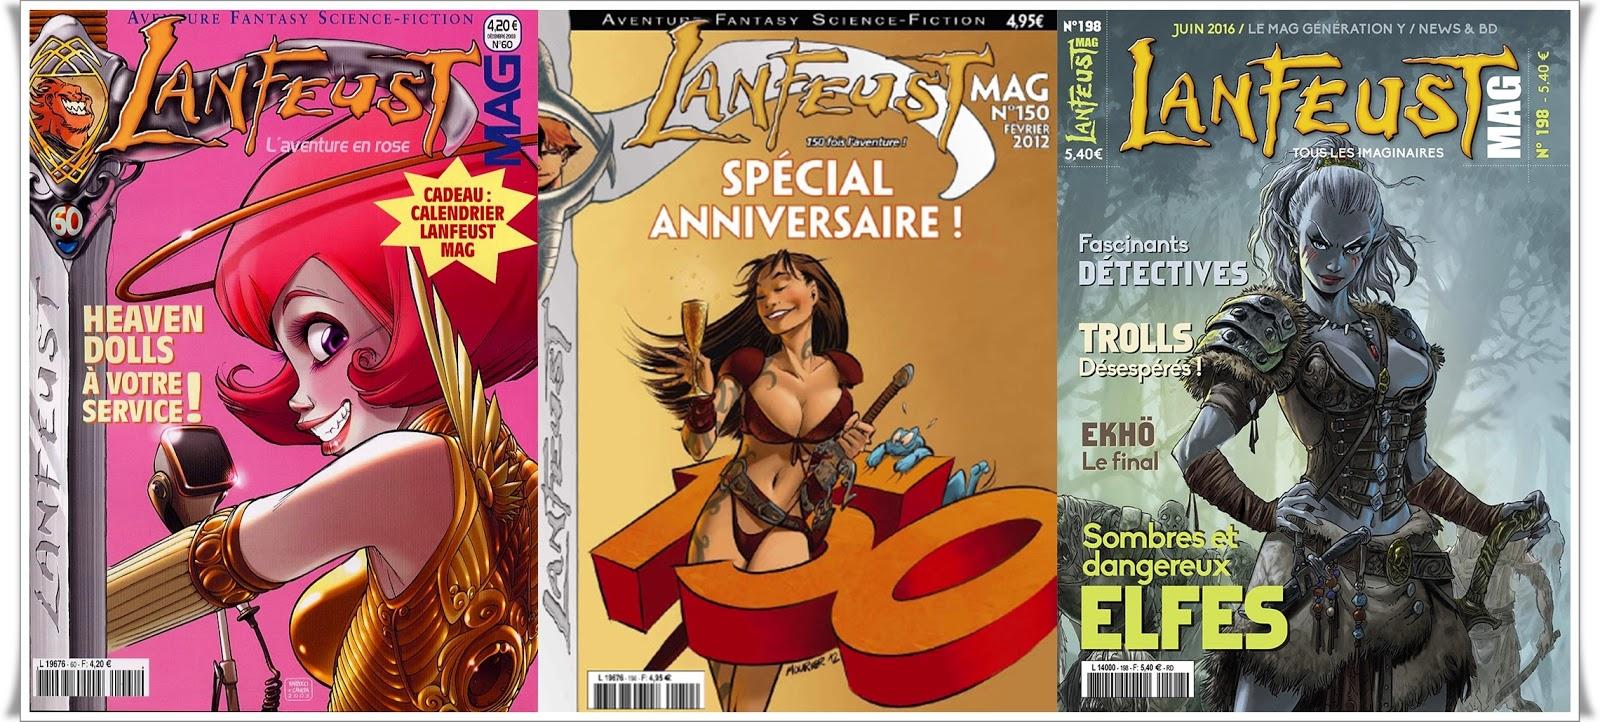 a8ffd116398 Δημιουργημένο το 1998 από τους Christophe Arleston,Dominique Latil και  Mourad Boudjellal το περιοδικό δημοσίευε ιστορίες κόμικ σχεδόν από όλα τα  ...